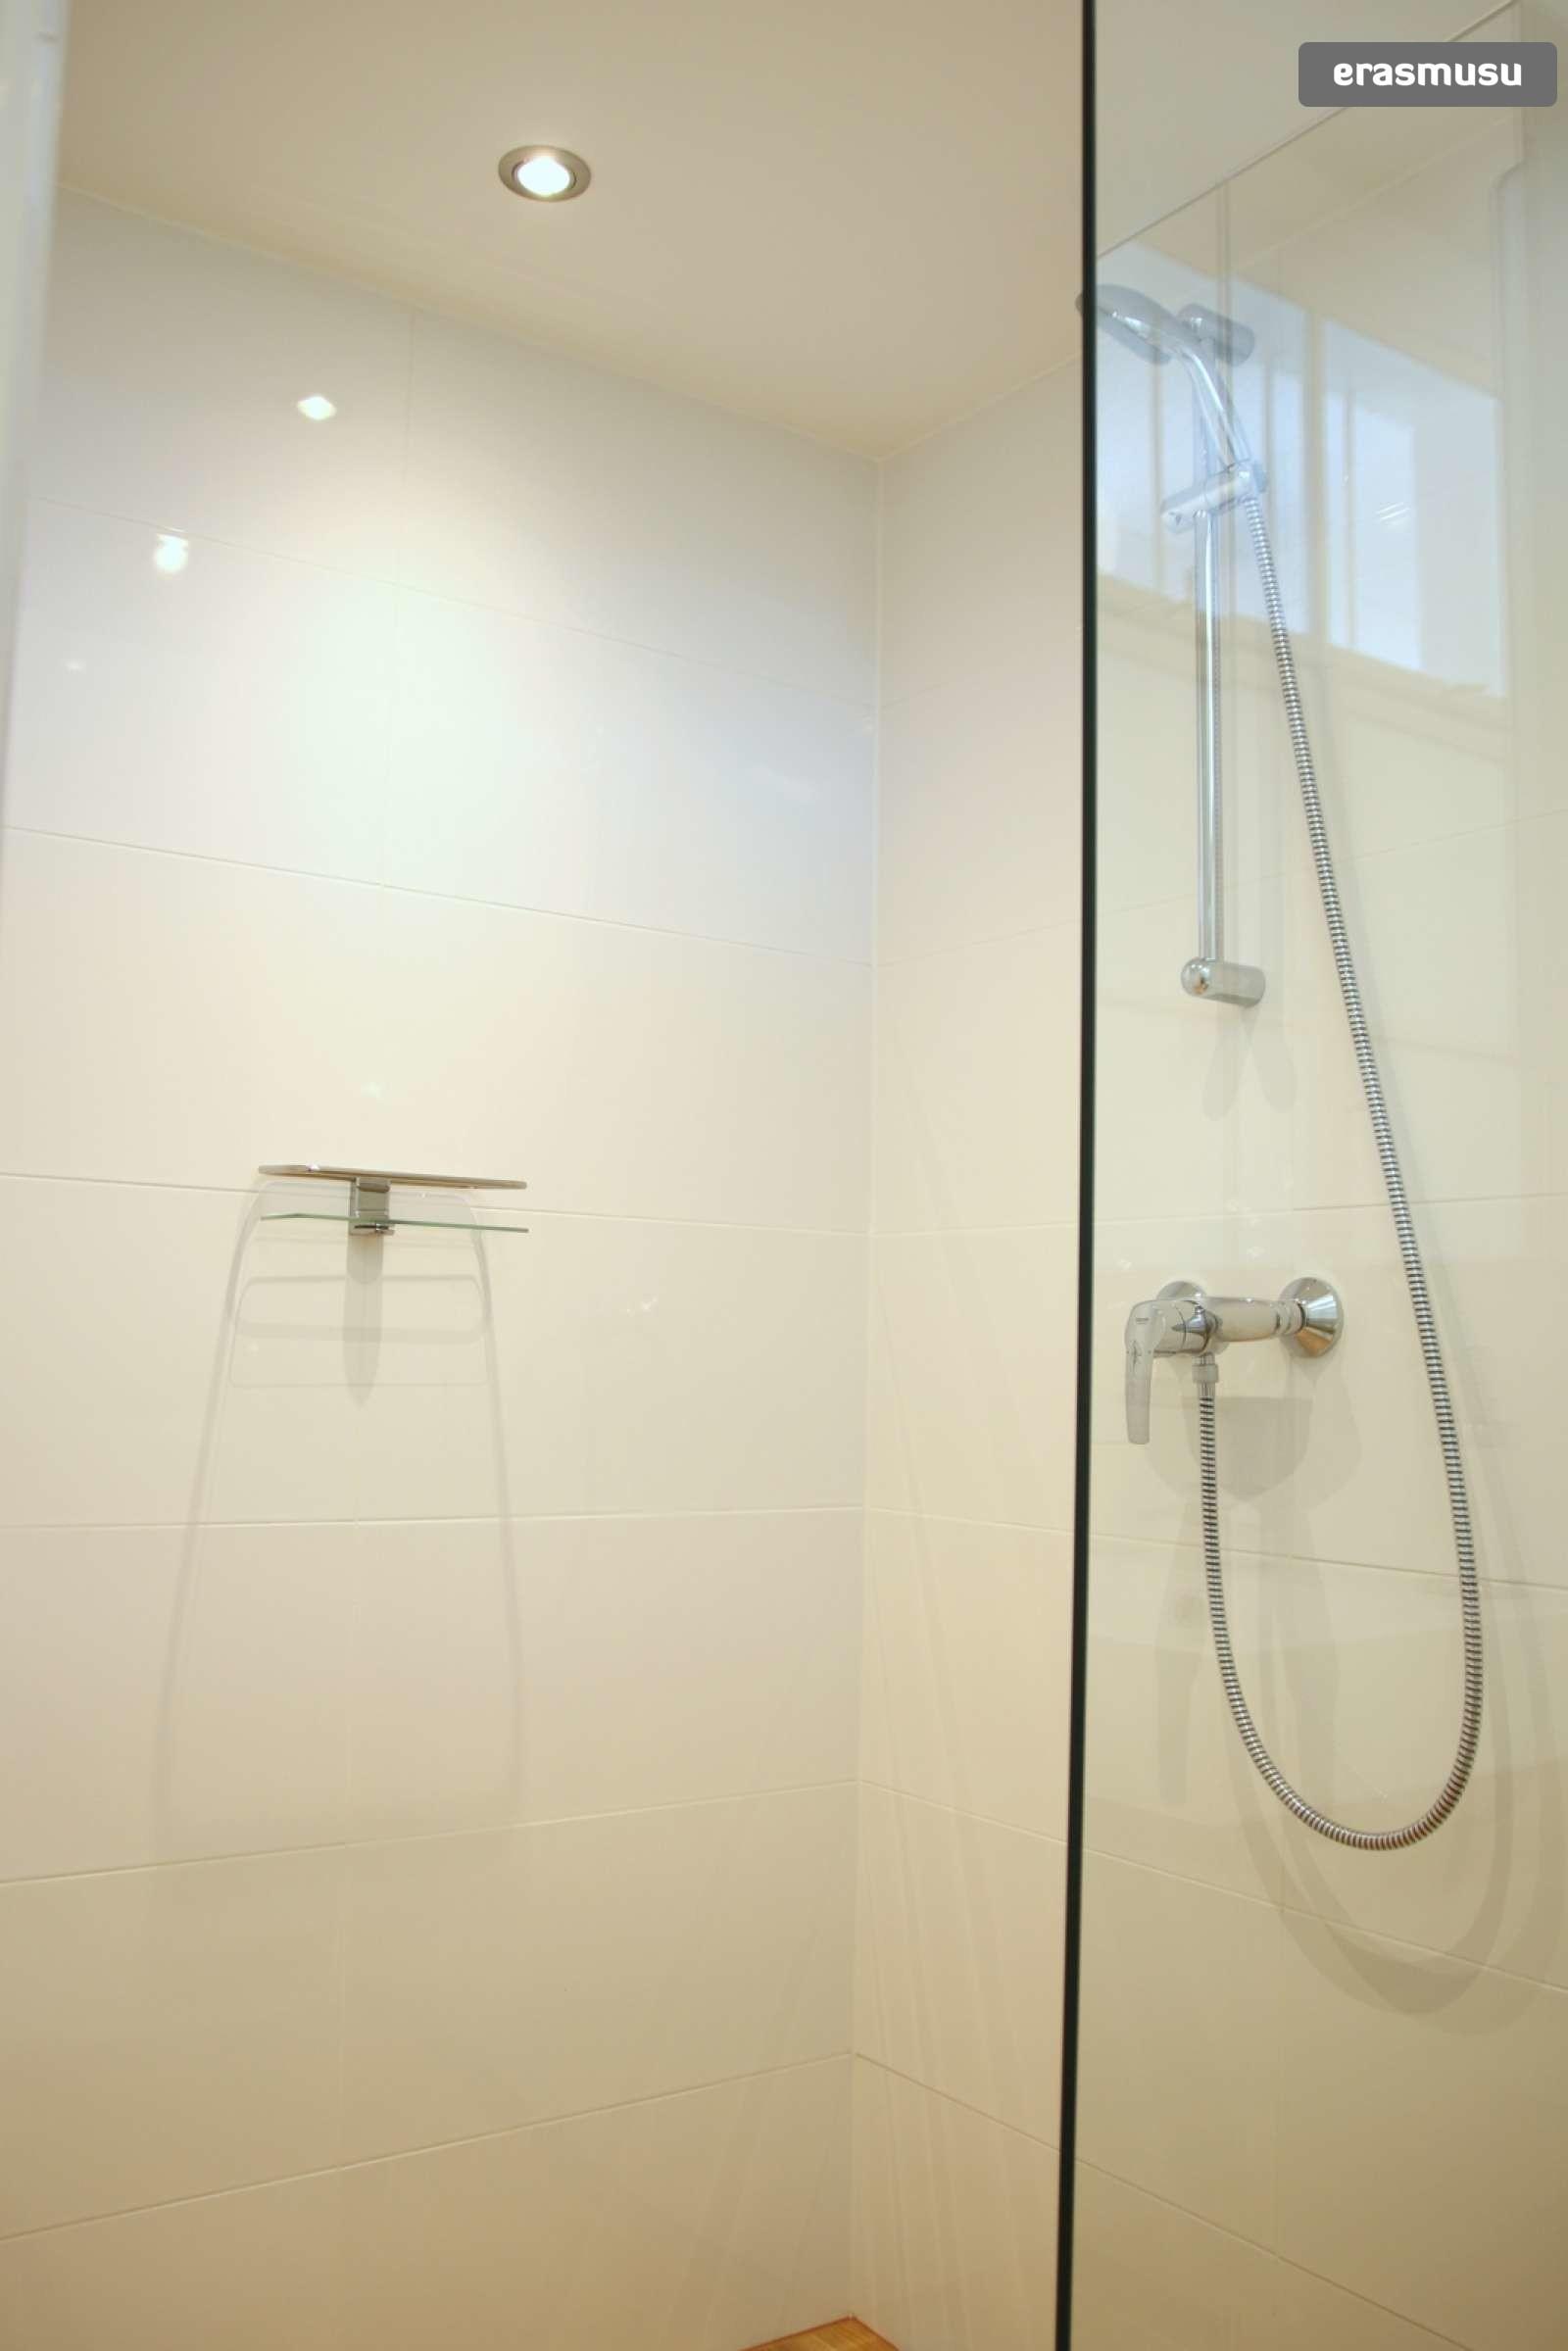 studio-apartment-rent-wahring-dd64ede876dcad850de5fe7e67ae06f1